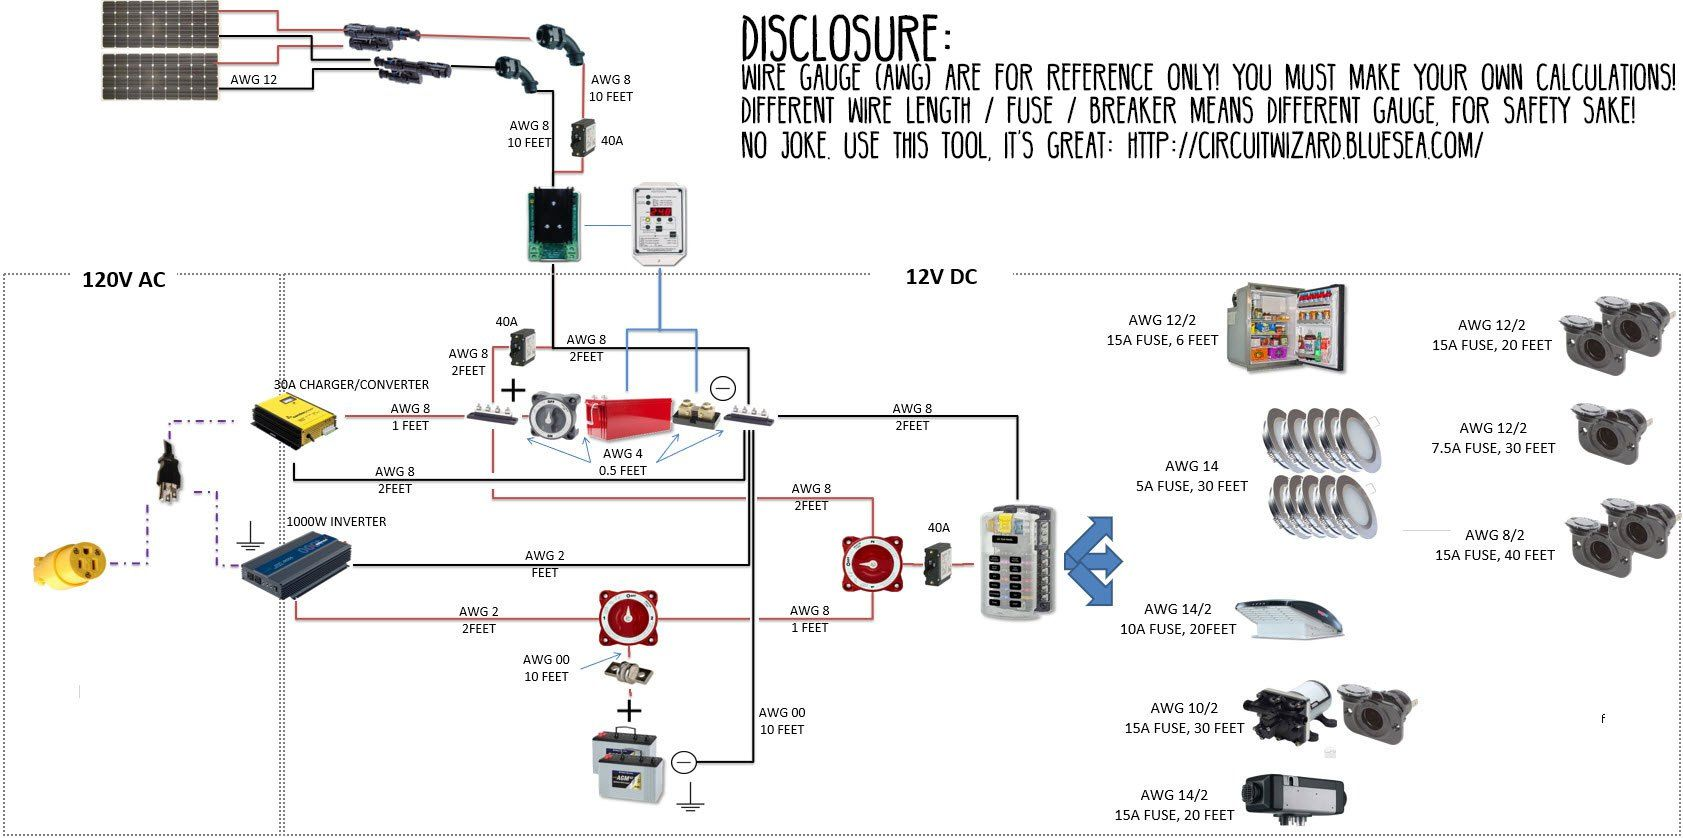 medium resolution of electrical diagram logical ford transit camper van v3 with disclosure